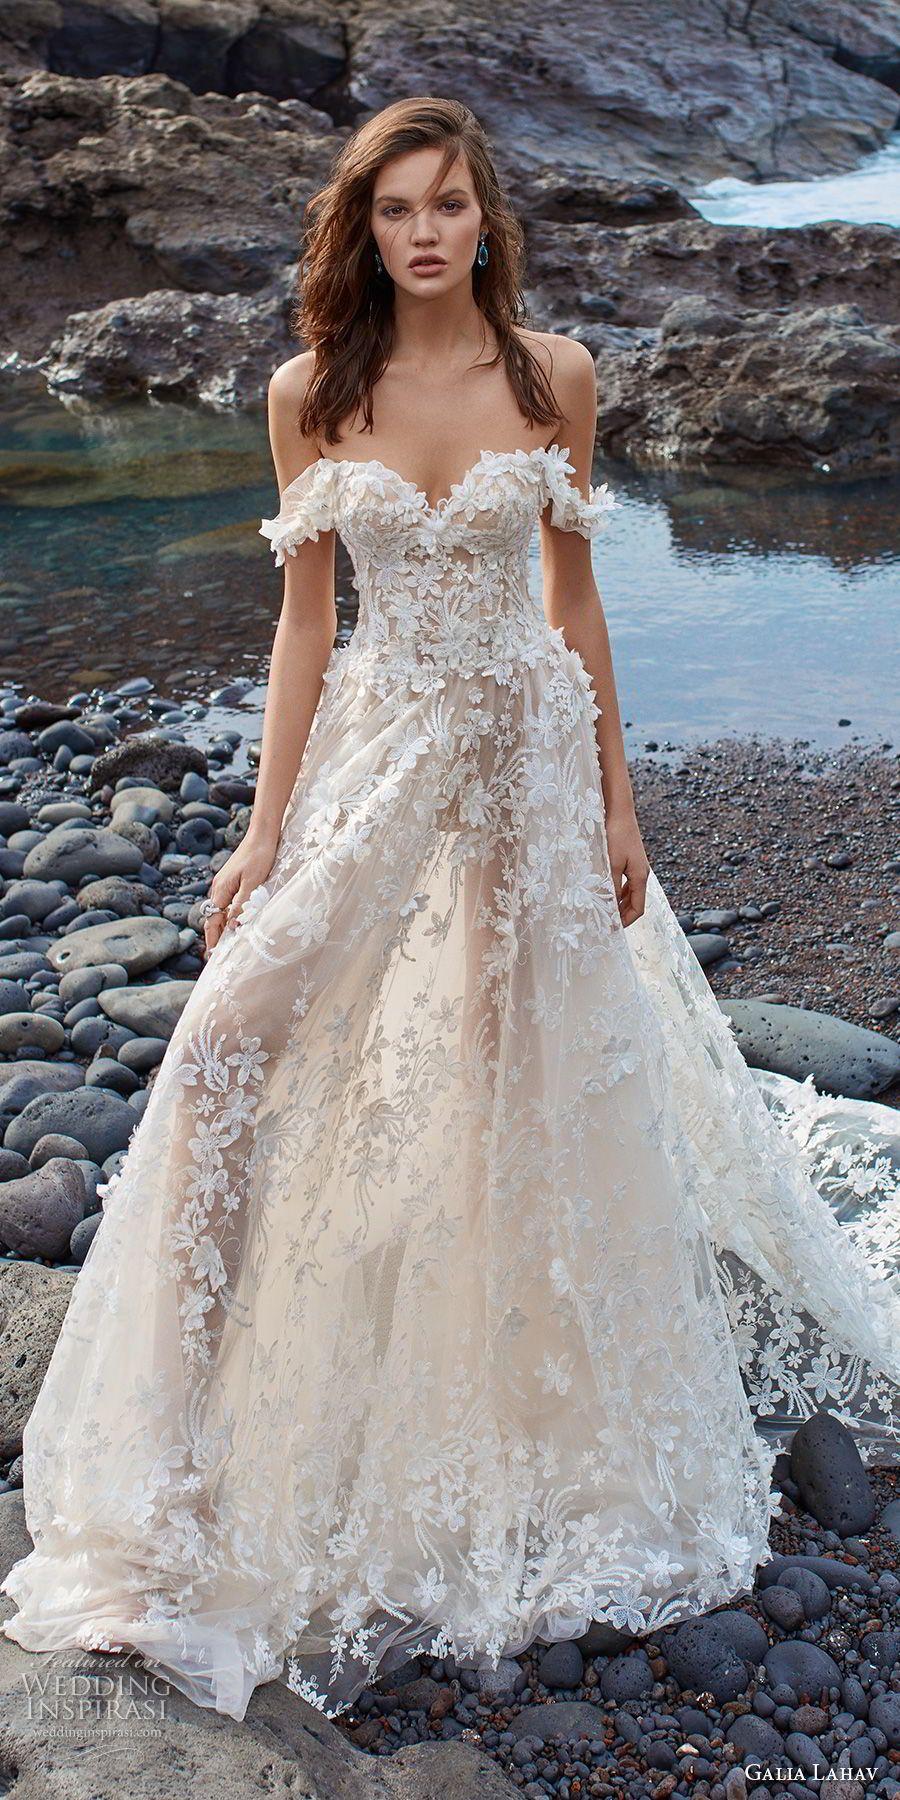 Gala By Galia Lahav Collection No 5 Wedding Dresses Wedding Inspirasi Galia Lahav Wedding Dress Wedding Dresses Dream Wedding Dresses